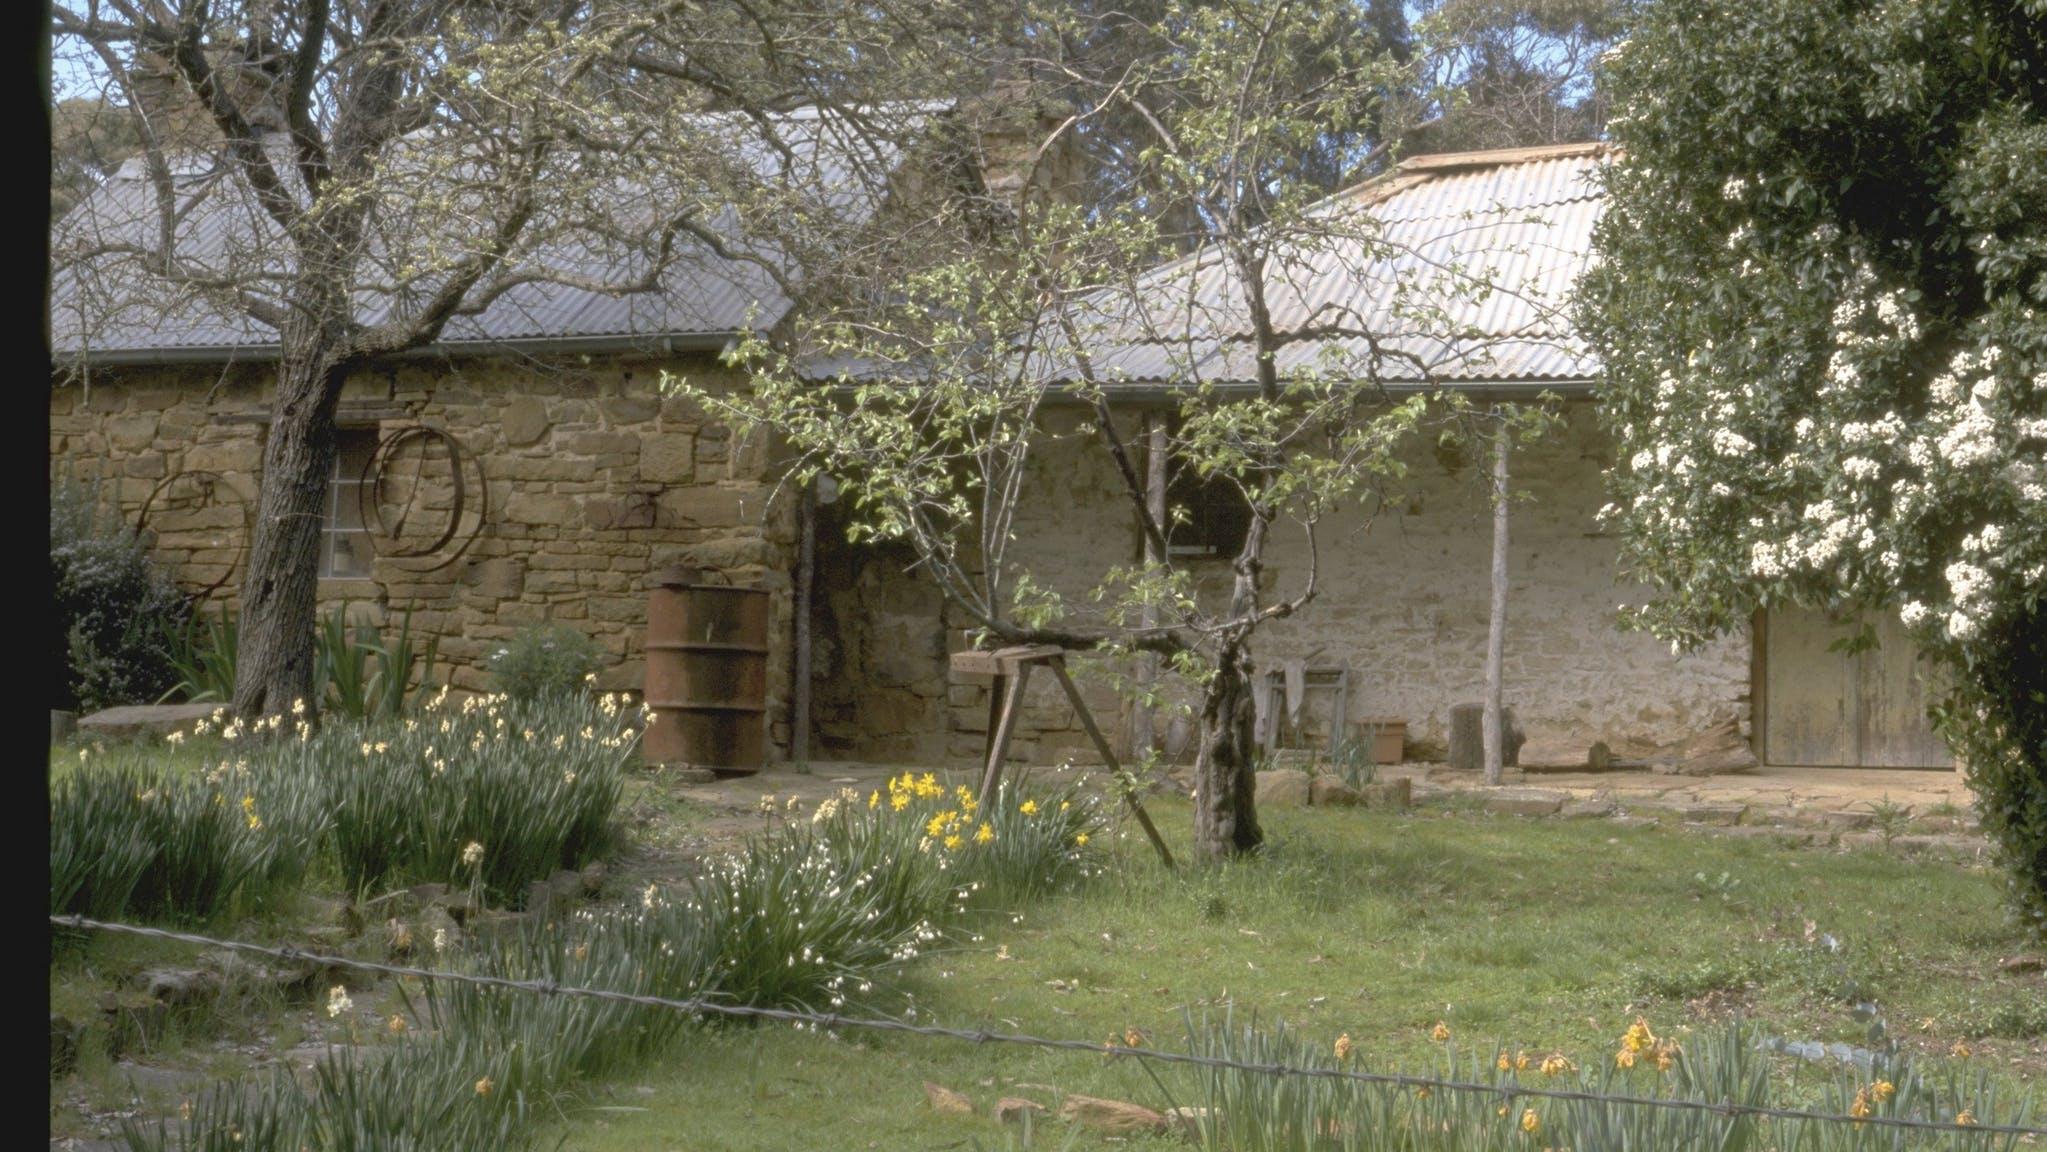 Castlemaine Diggings National Heritage Park